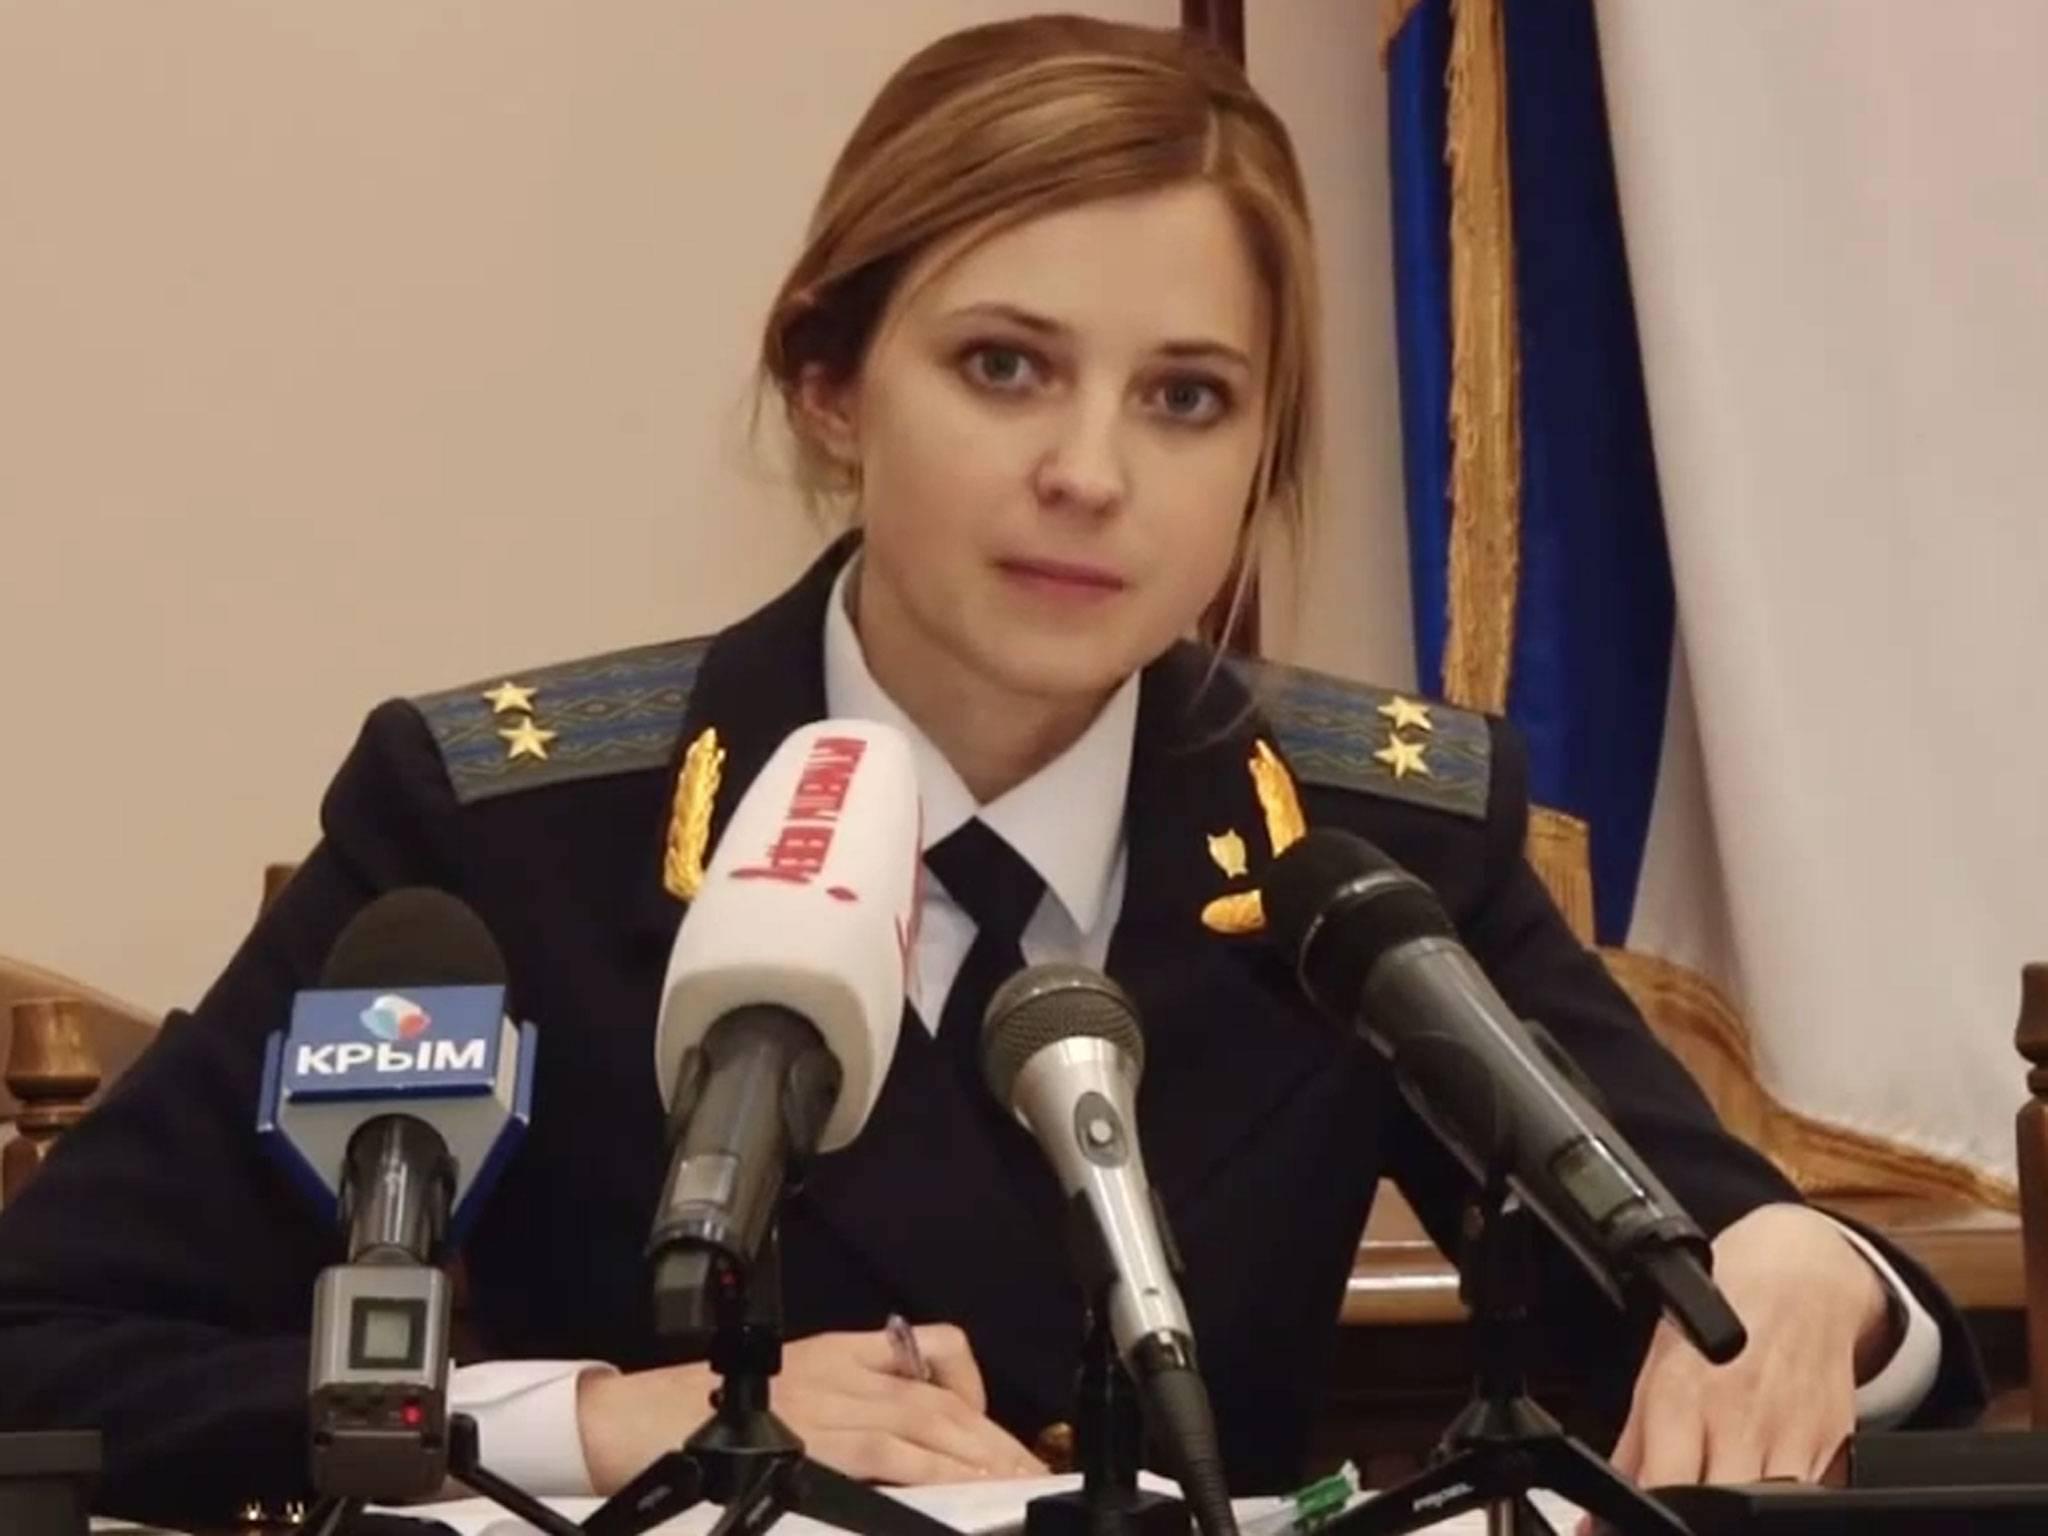 Natalya Poklonskaya called on experts to evaluate the plot of the film Matilda January 30, 2017 71